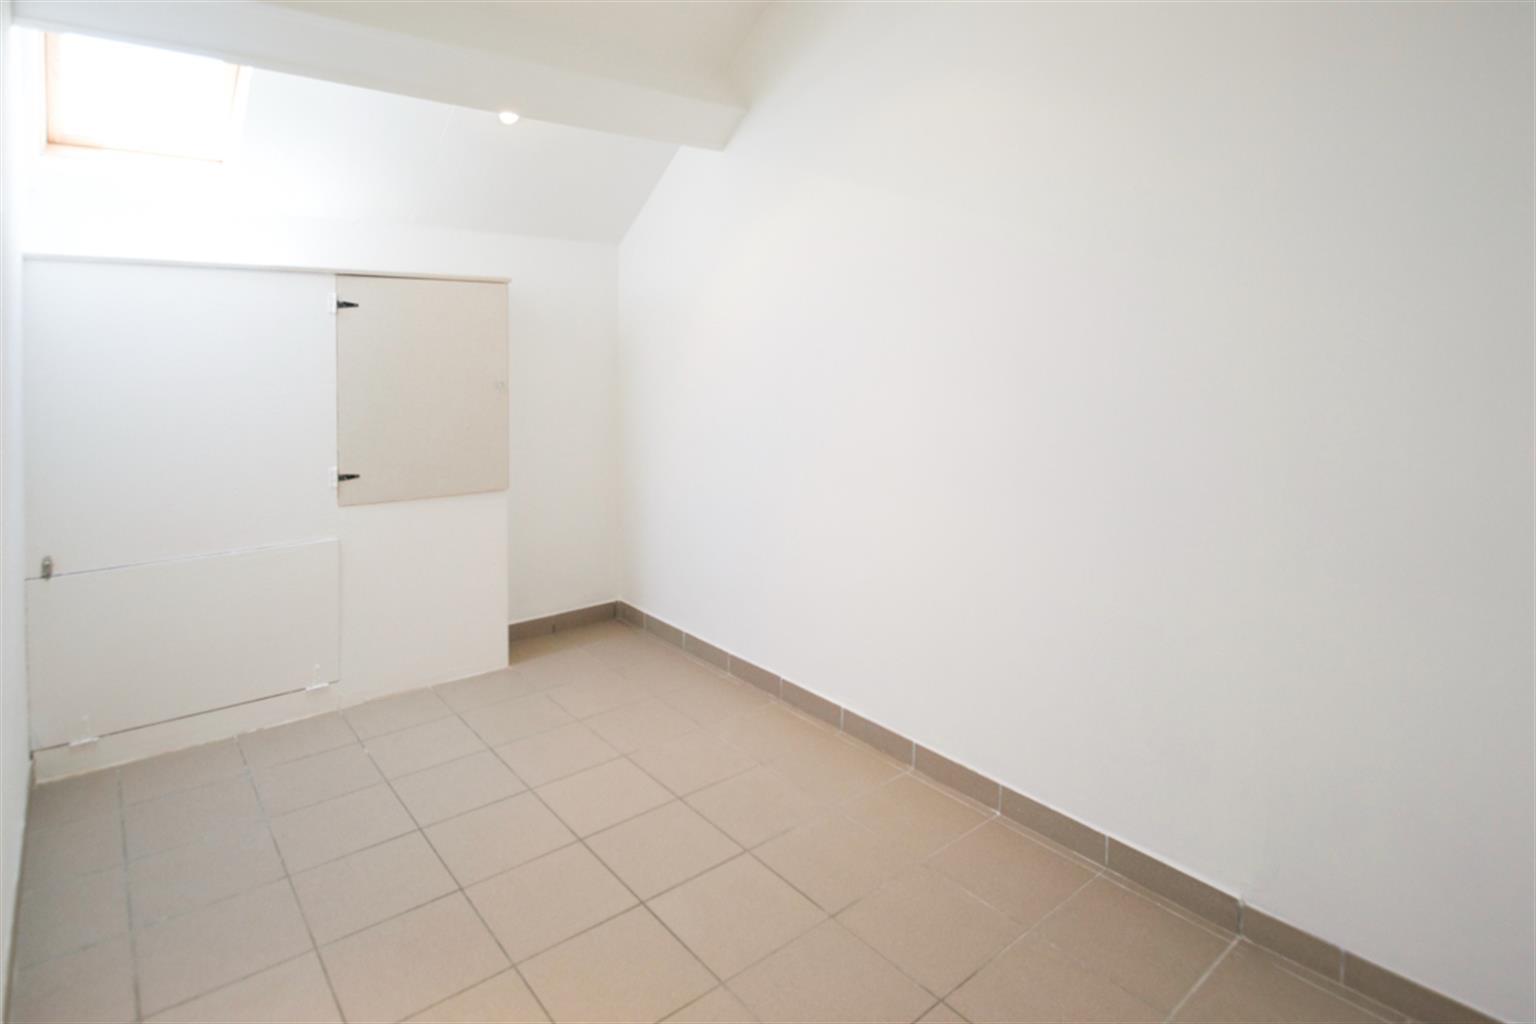 Appartement - Leval-Trahegnies - #3779559-4